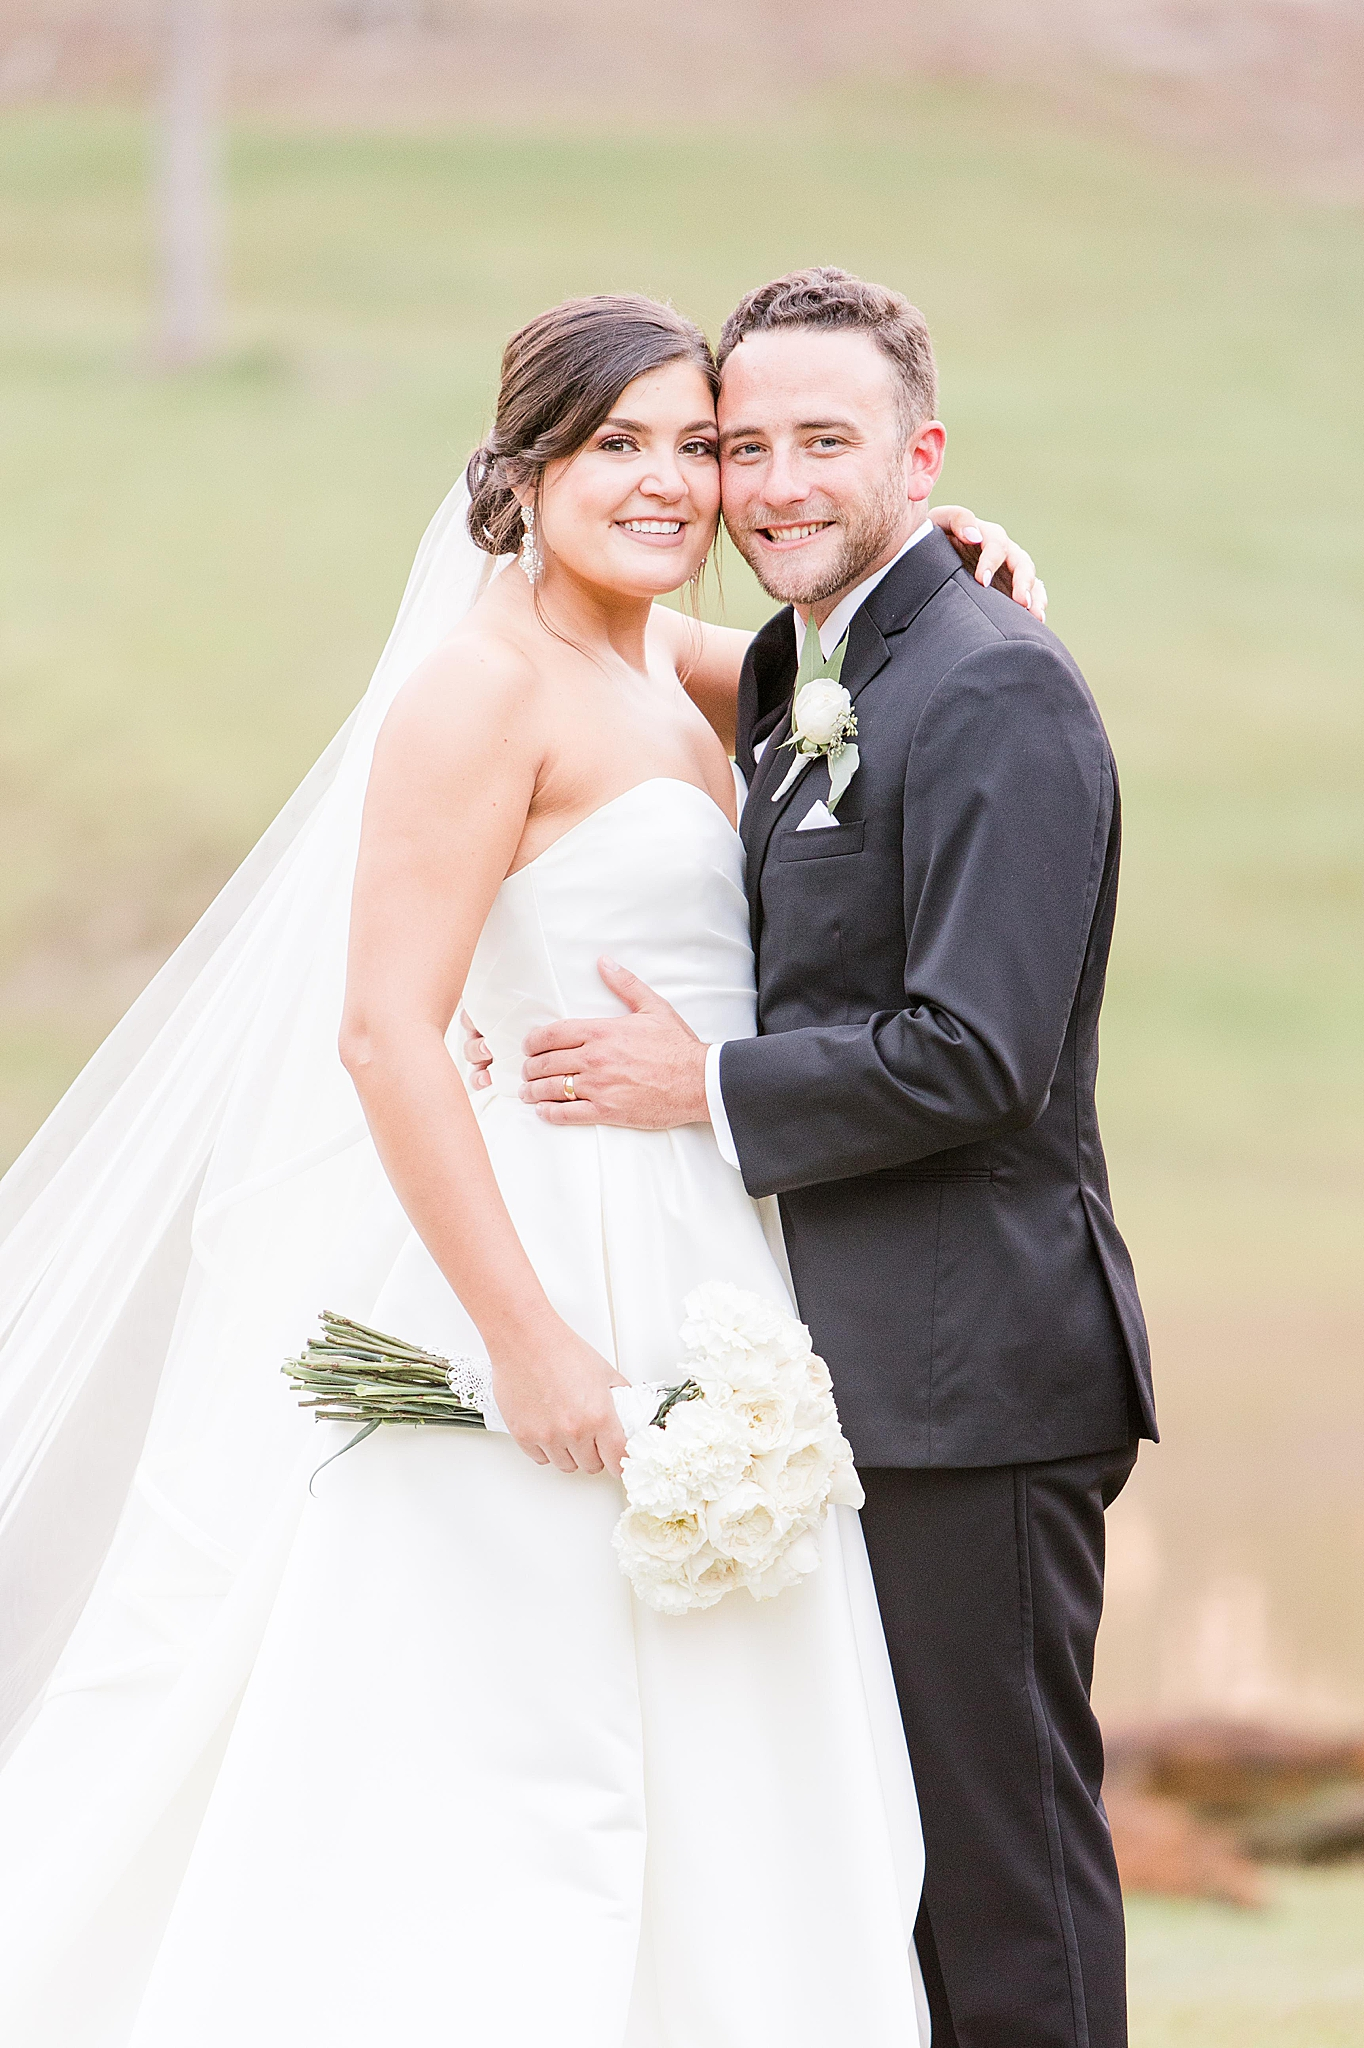 bride and groom pose at Izenstone